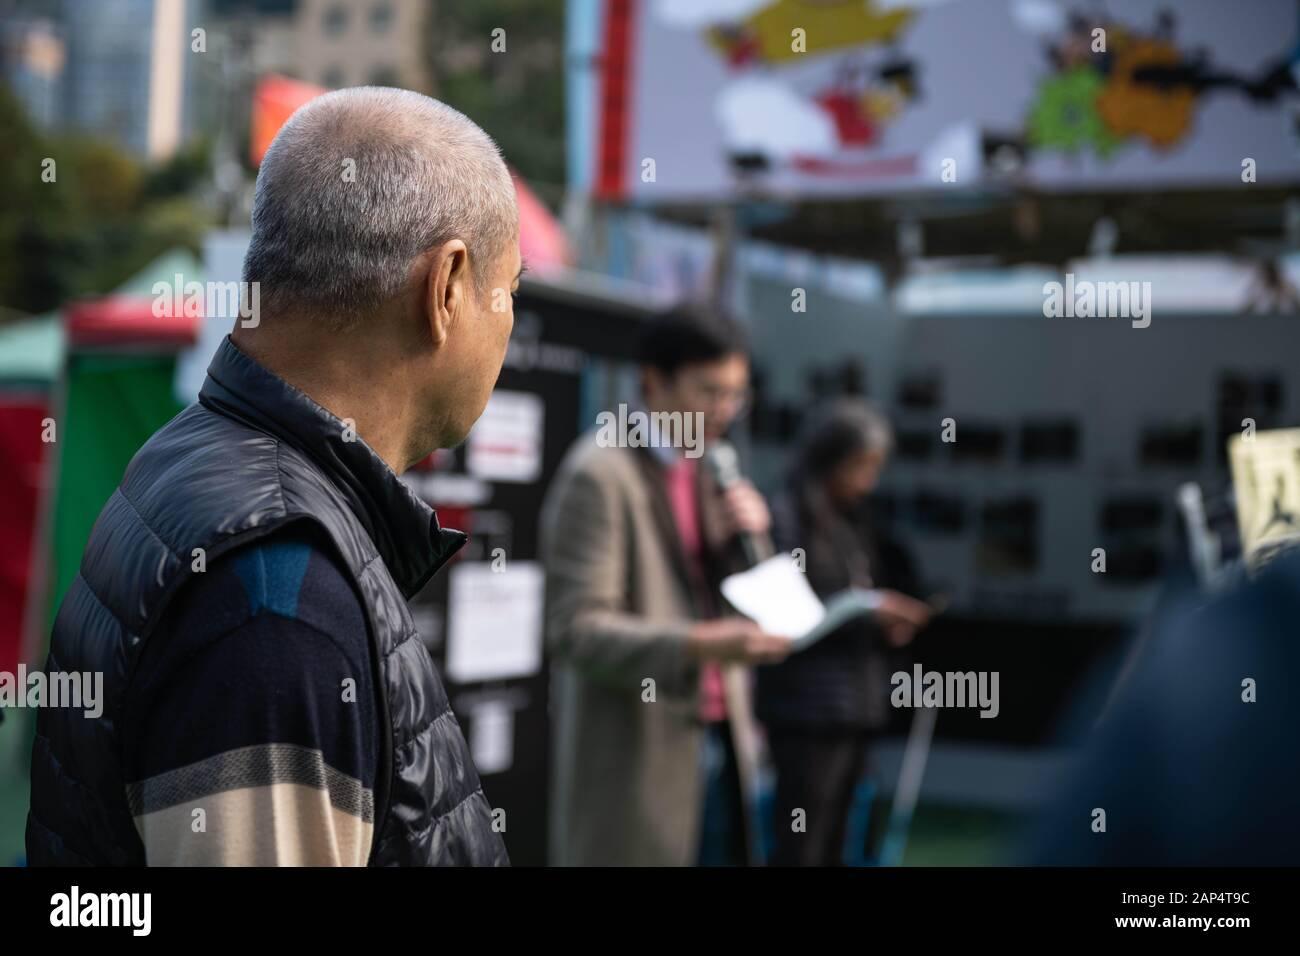 January 20, 2020, Hong Kong, Hong Kong, China: A man listens to Clayton Ng speak from a stall at the Hong Kong Lunar New Years Festival at Victoria Park on 1/20/2020 (Credit Image: © Tyler Tomasello/ZUMA Wire) Stock Photo